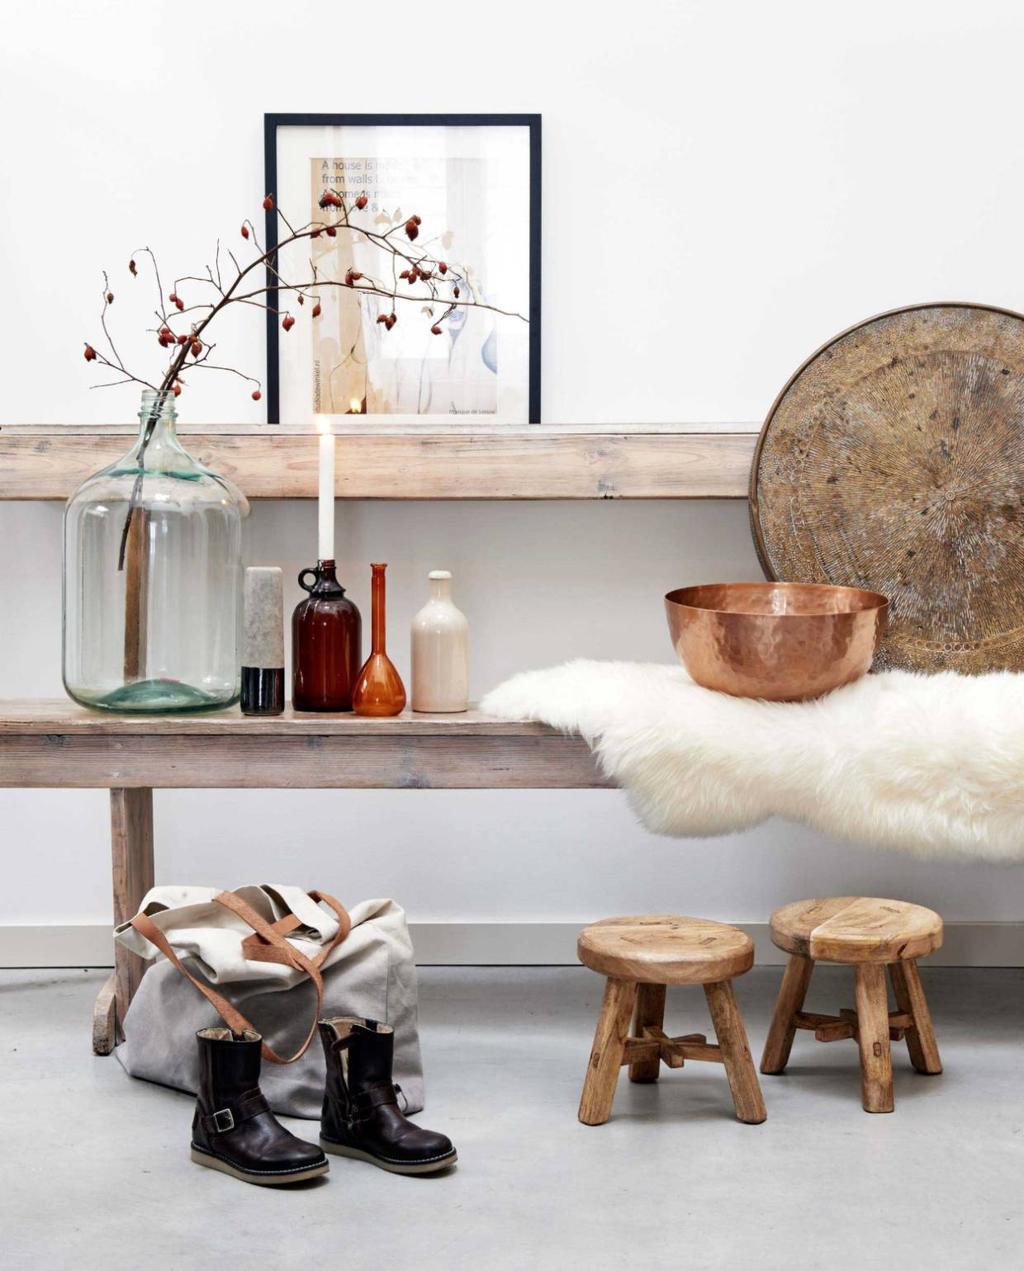 landelijk hal krukje hout bankje koper vtwonen | koper schoonmaken en poetsen